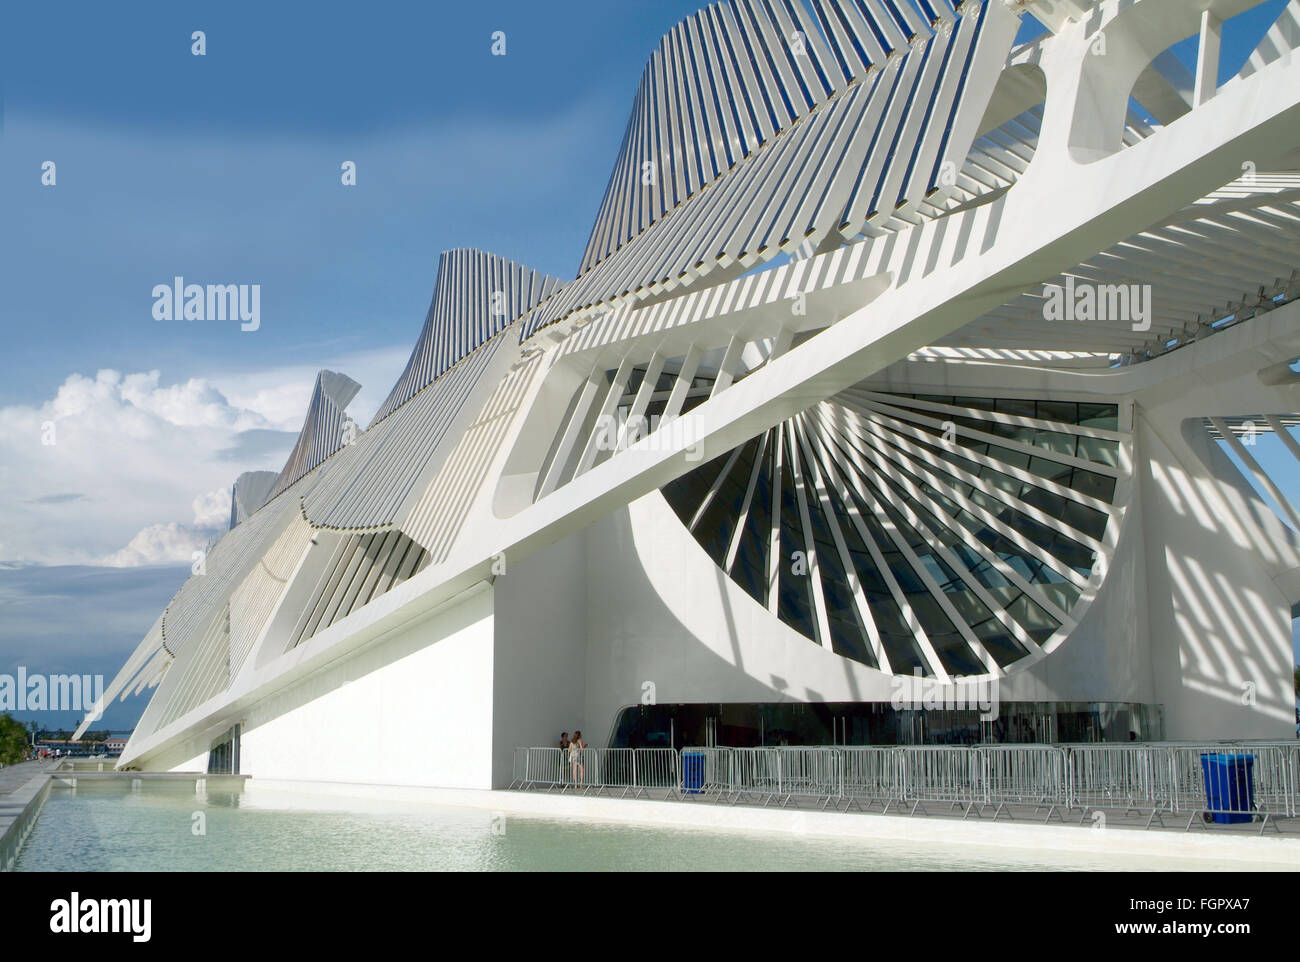 Rio de Janeiro, Brazil - Museum of Tomorrow - Stock Image